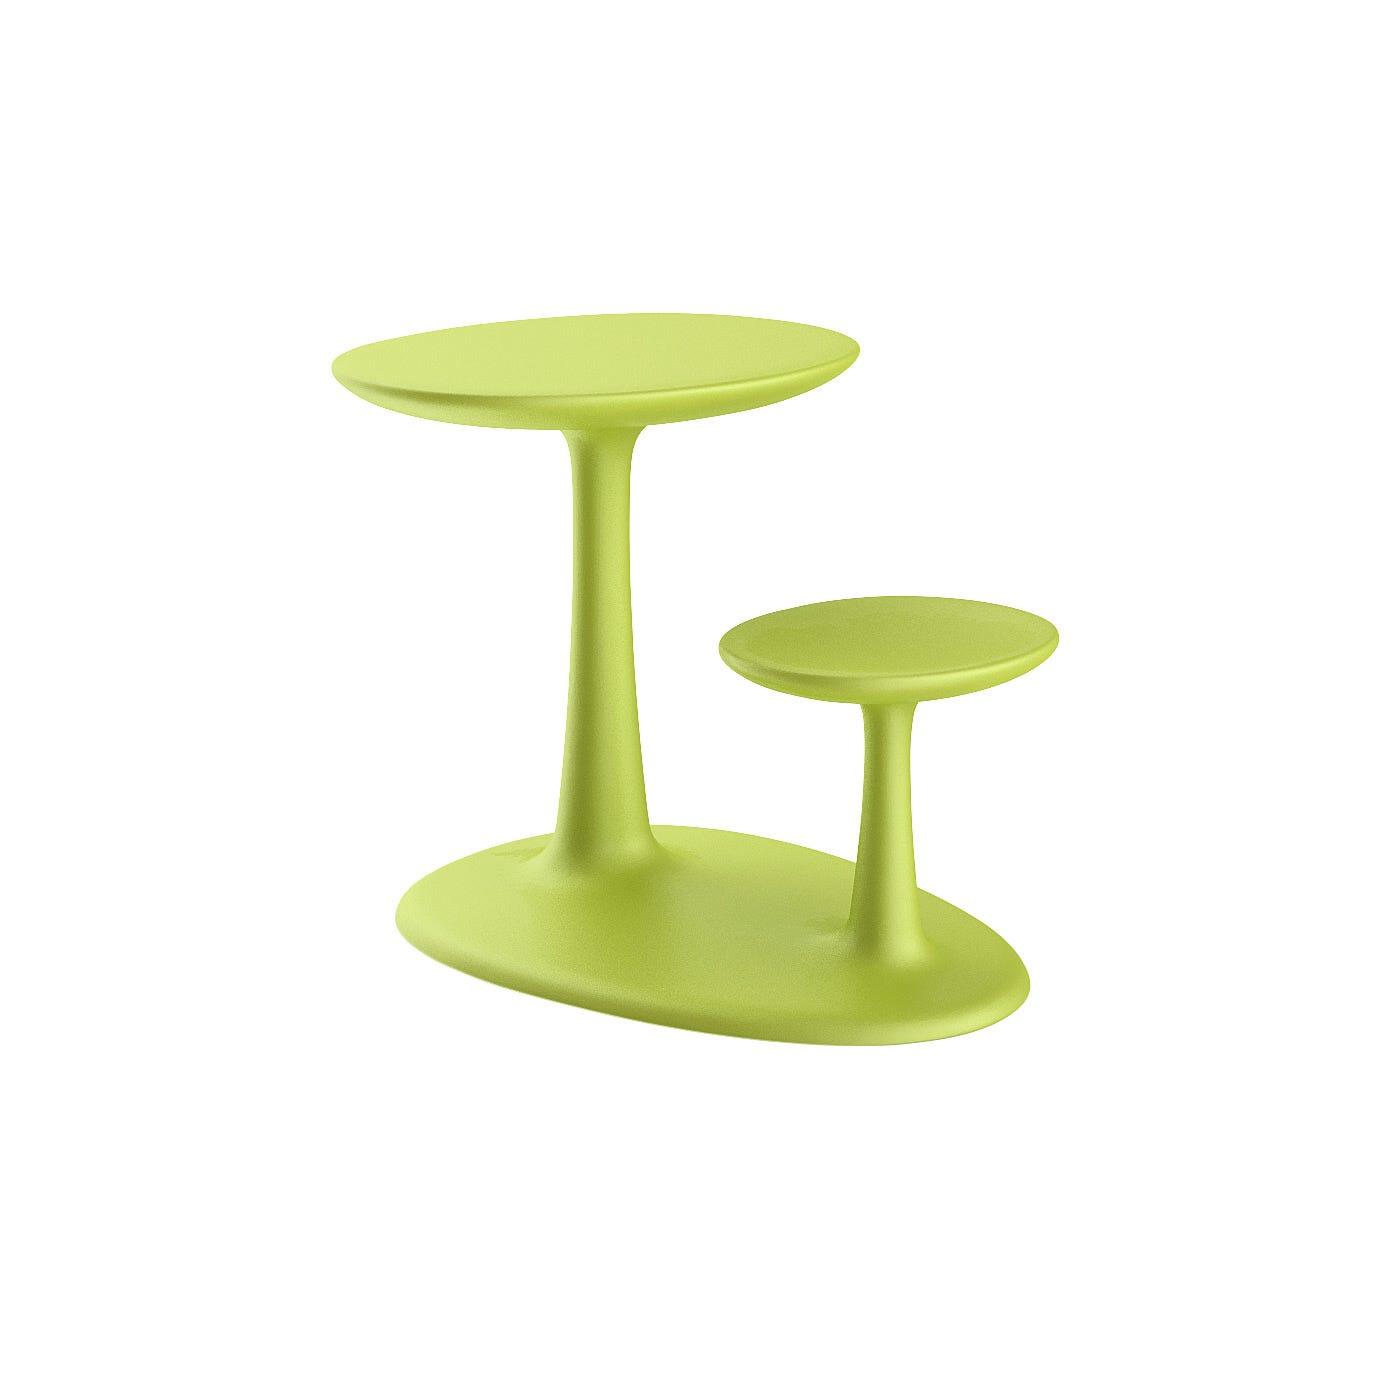 Alfie Funghi Desk Stool